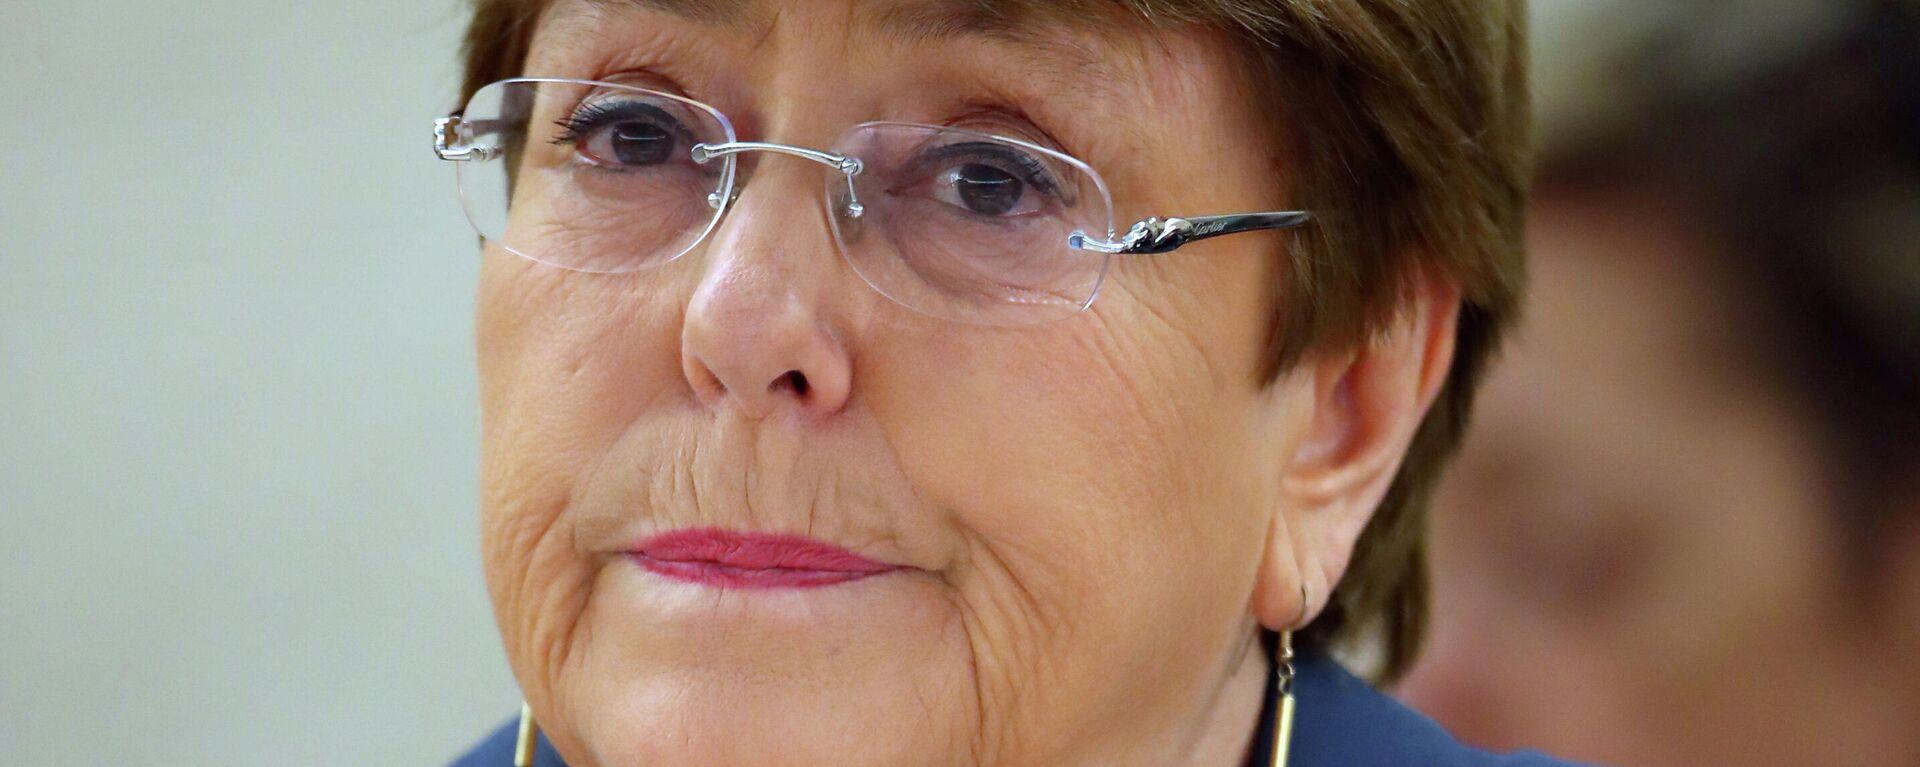 Michelle Bachelet, Alta Comisionada de la ONU para los DDHH - Sputnik Mundo, 1920, 21.06.2021